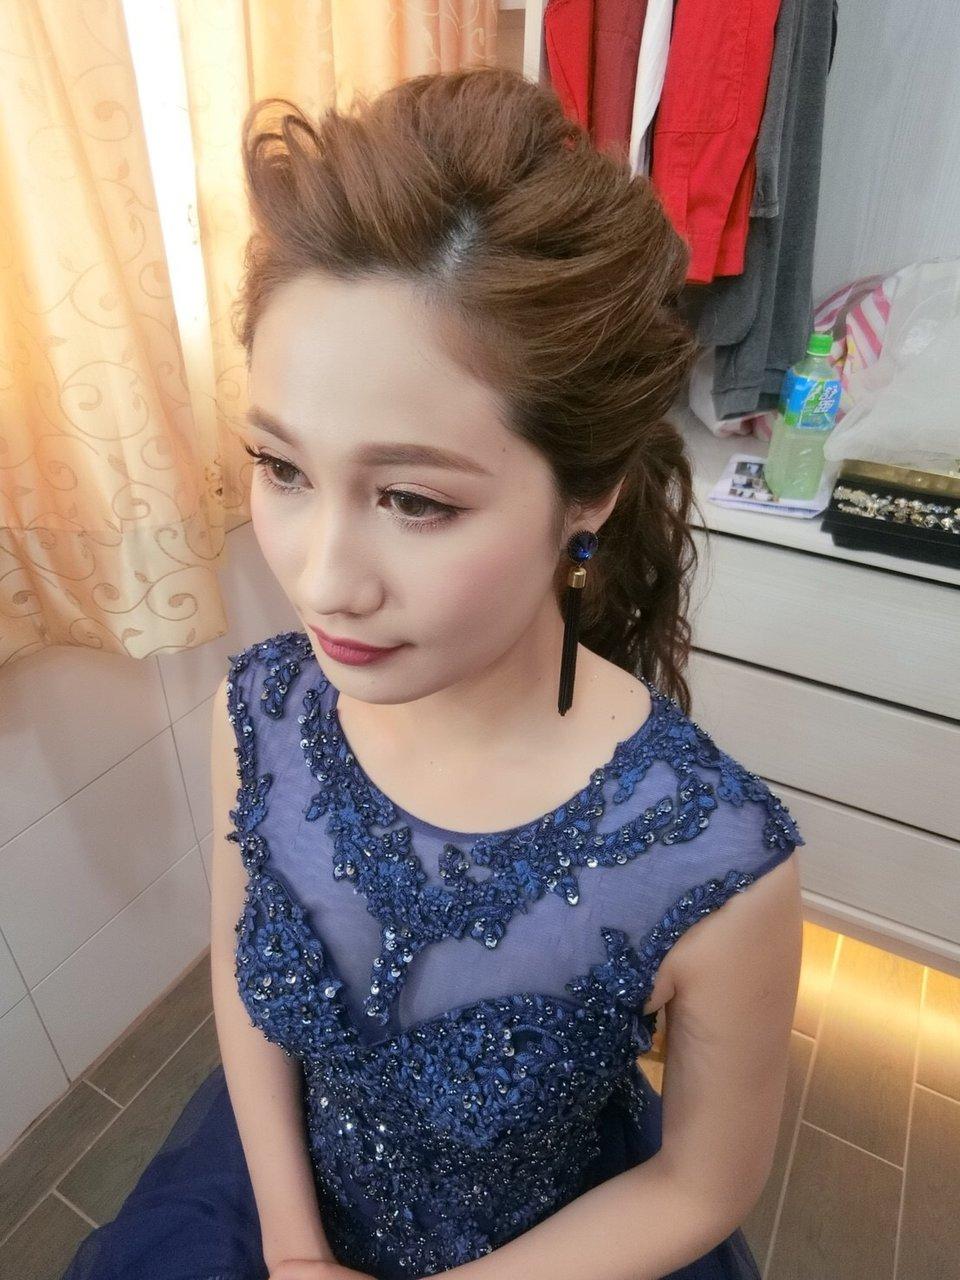 CY Style彩妝造型 新娘秘書,放心交給新秘桌子老師?滿意?️照片為證❤️